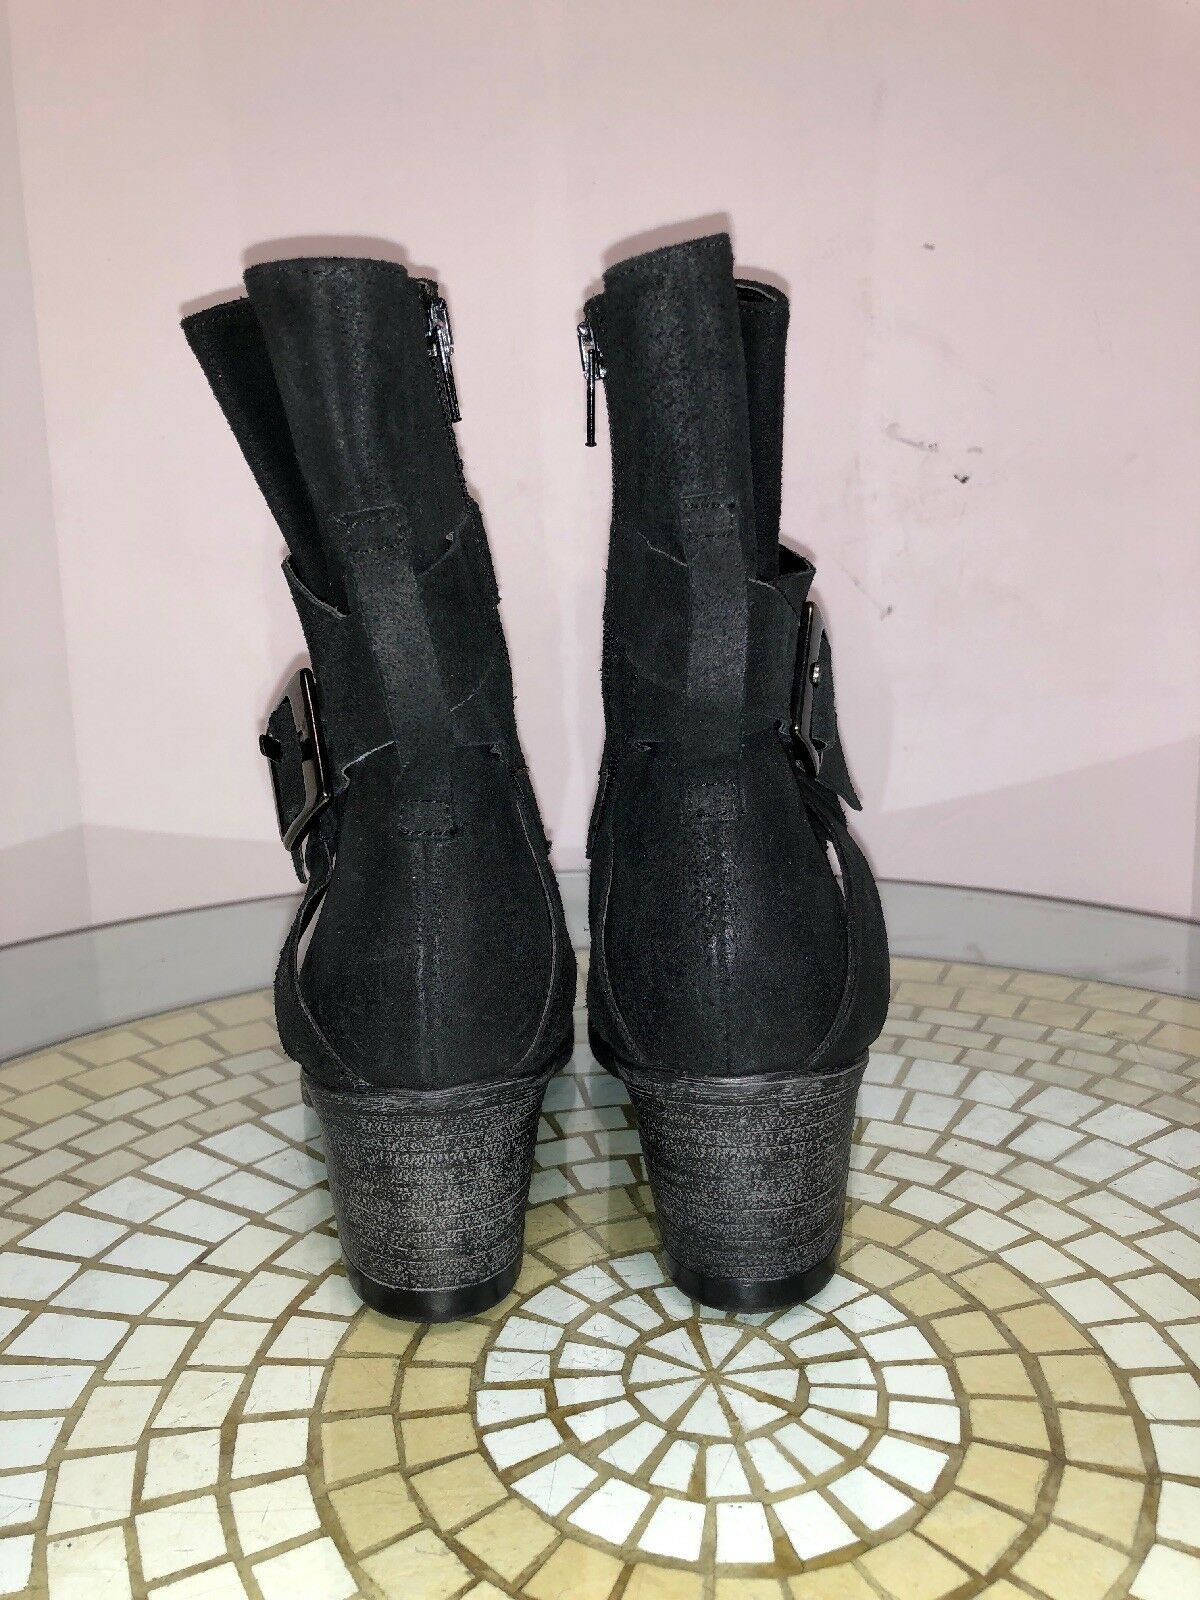 CARVELA KURT GEIGER damen Distress Blk Blk Blk leather Side Zip ankle Stiefel sz. 36 NEW ed28b6